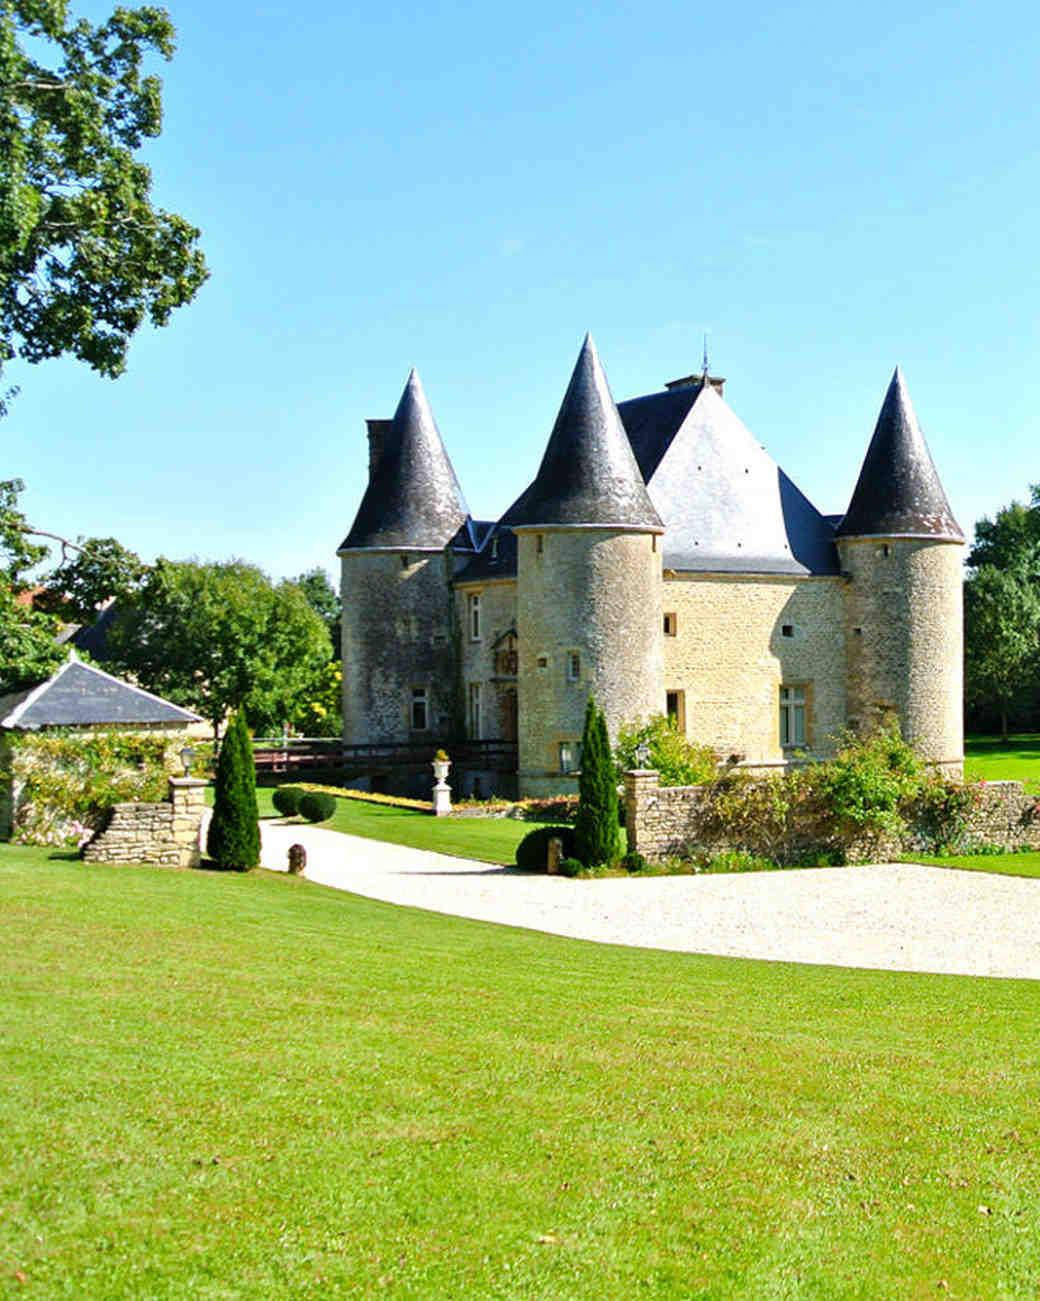 airbnb-wedding-venues-champagne-ardenne-france-0515.jpg